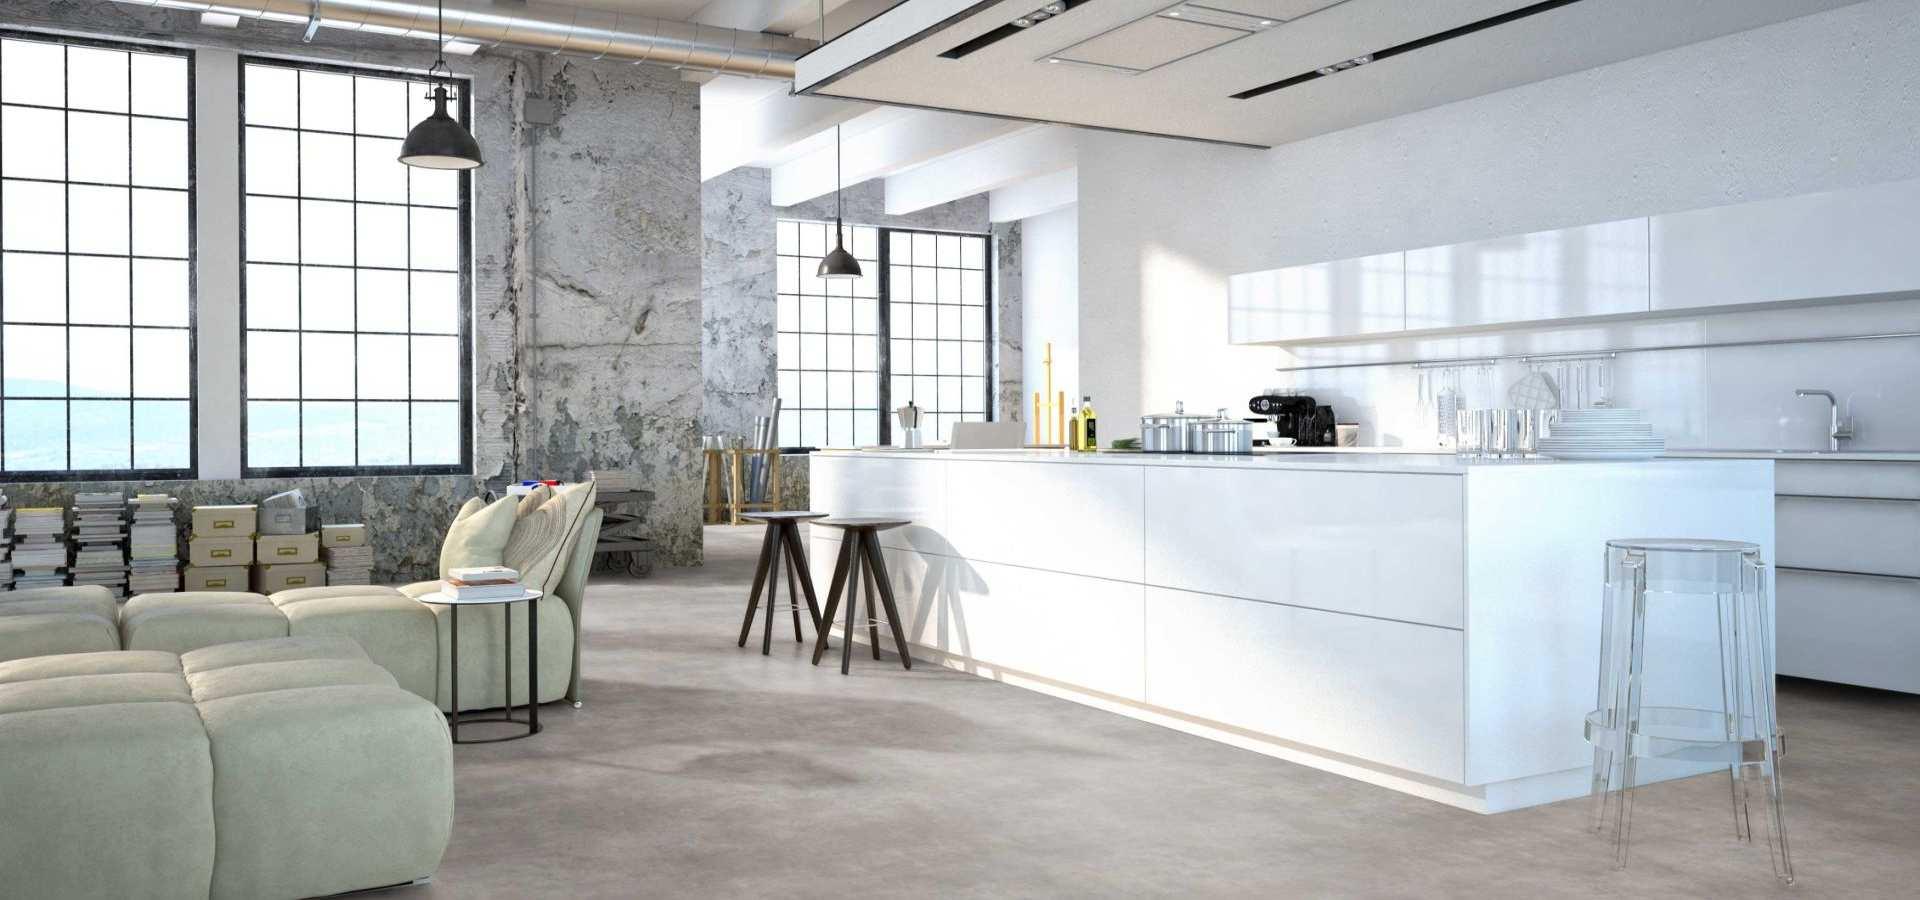 Bild Küche mit CV Belag betonoptik hellgrau